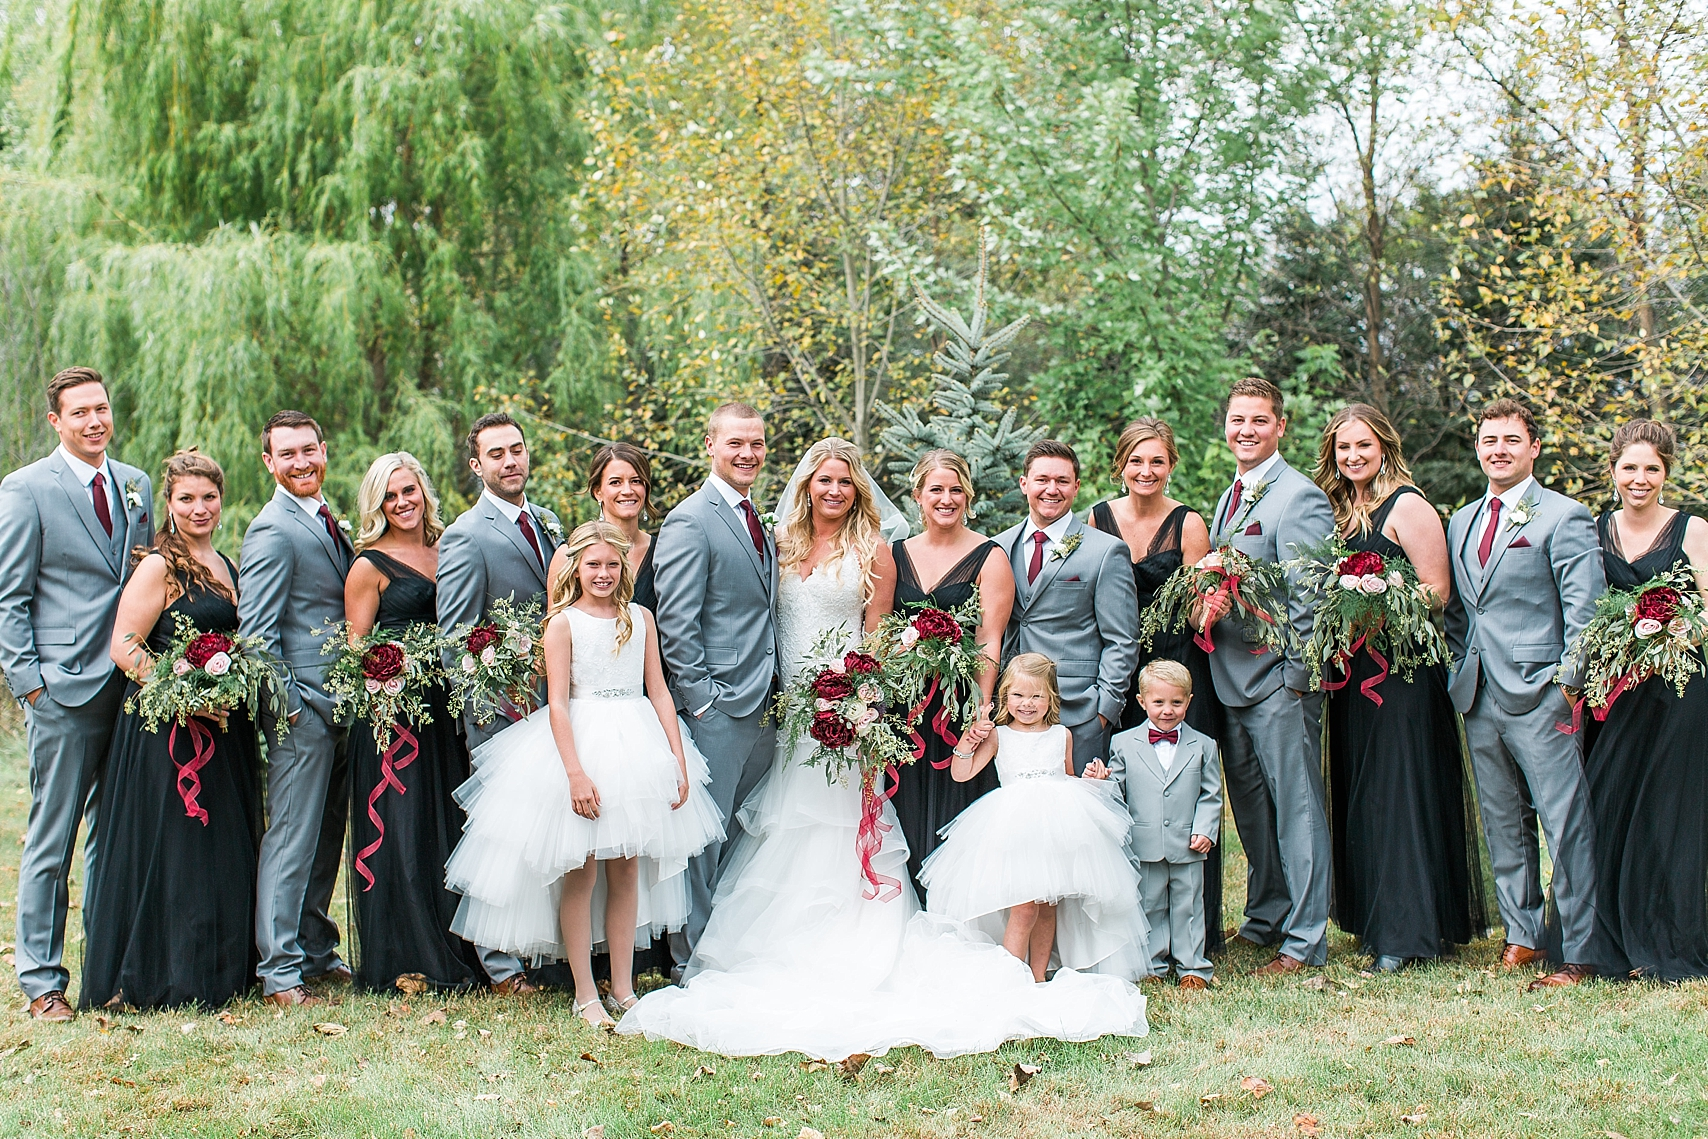 Minnesota Minneapolis Wedding Photographer Best Of 2018 Weddings Mallory Kiesow Photography_0199.jpg